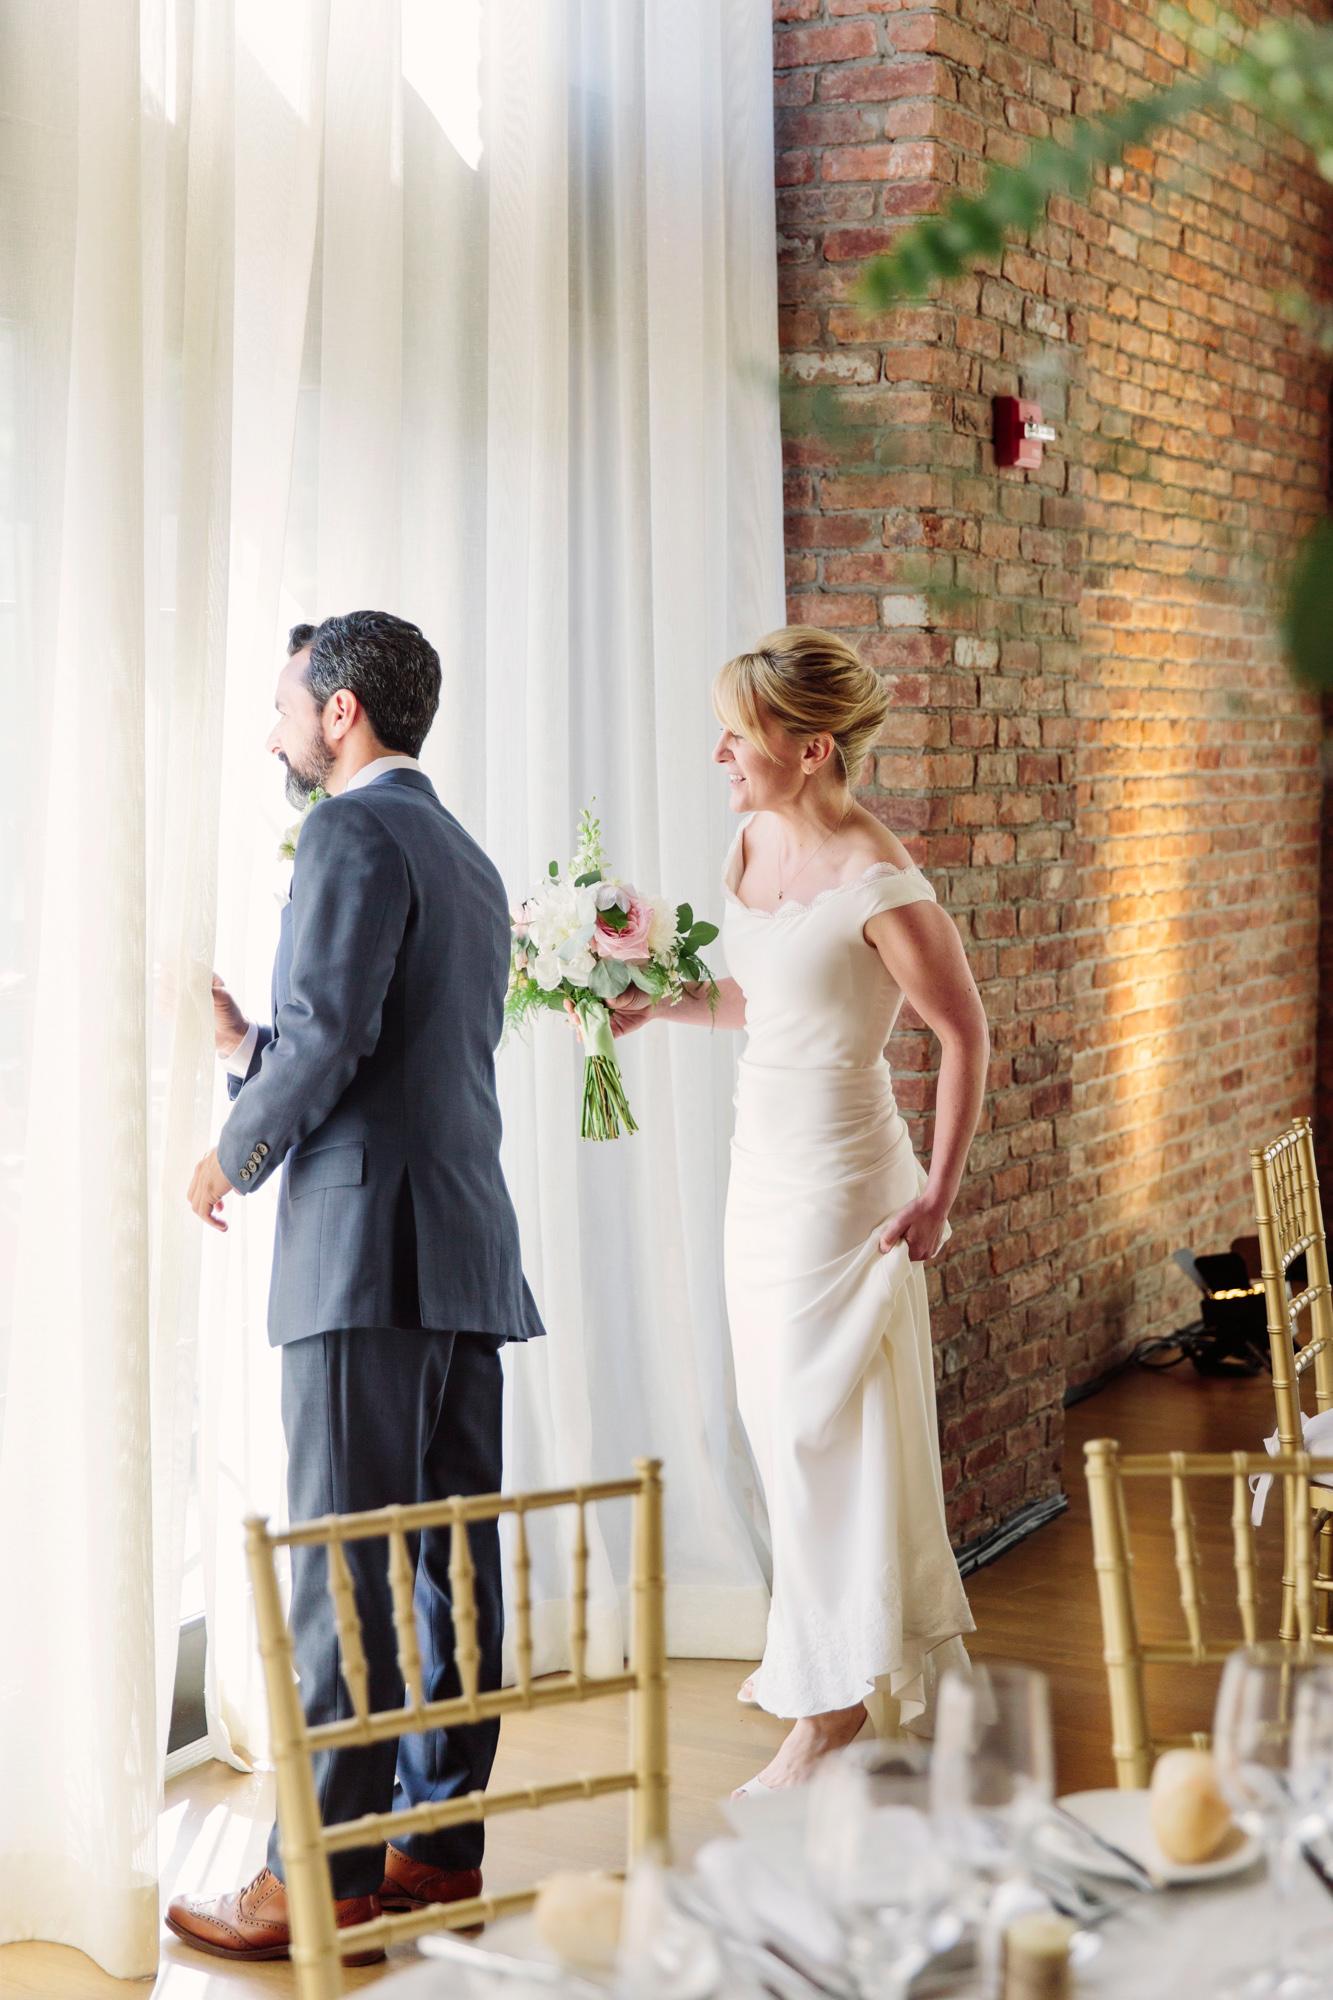 41_Rowan_Brian_The_Roundhouse_Wedding_Beacon_NY_Tanya_Salazar_Photography_475.jpg